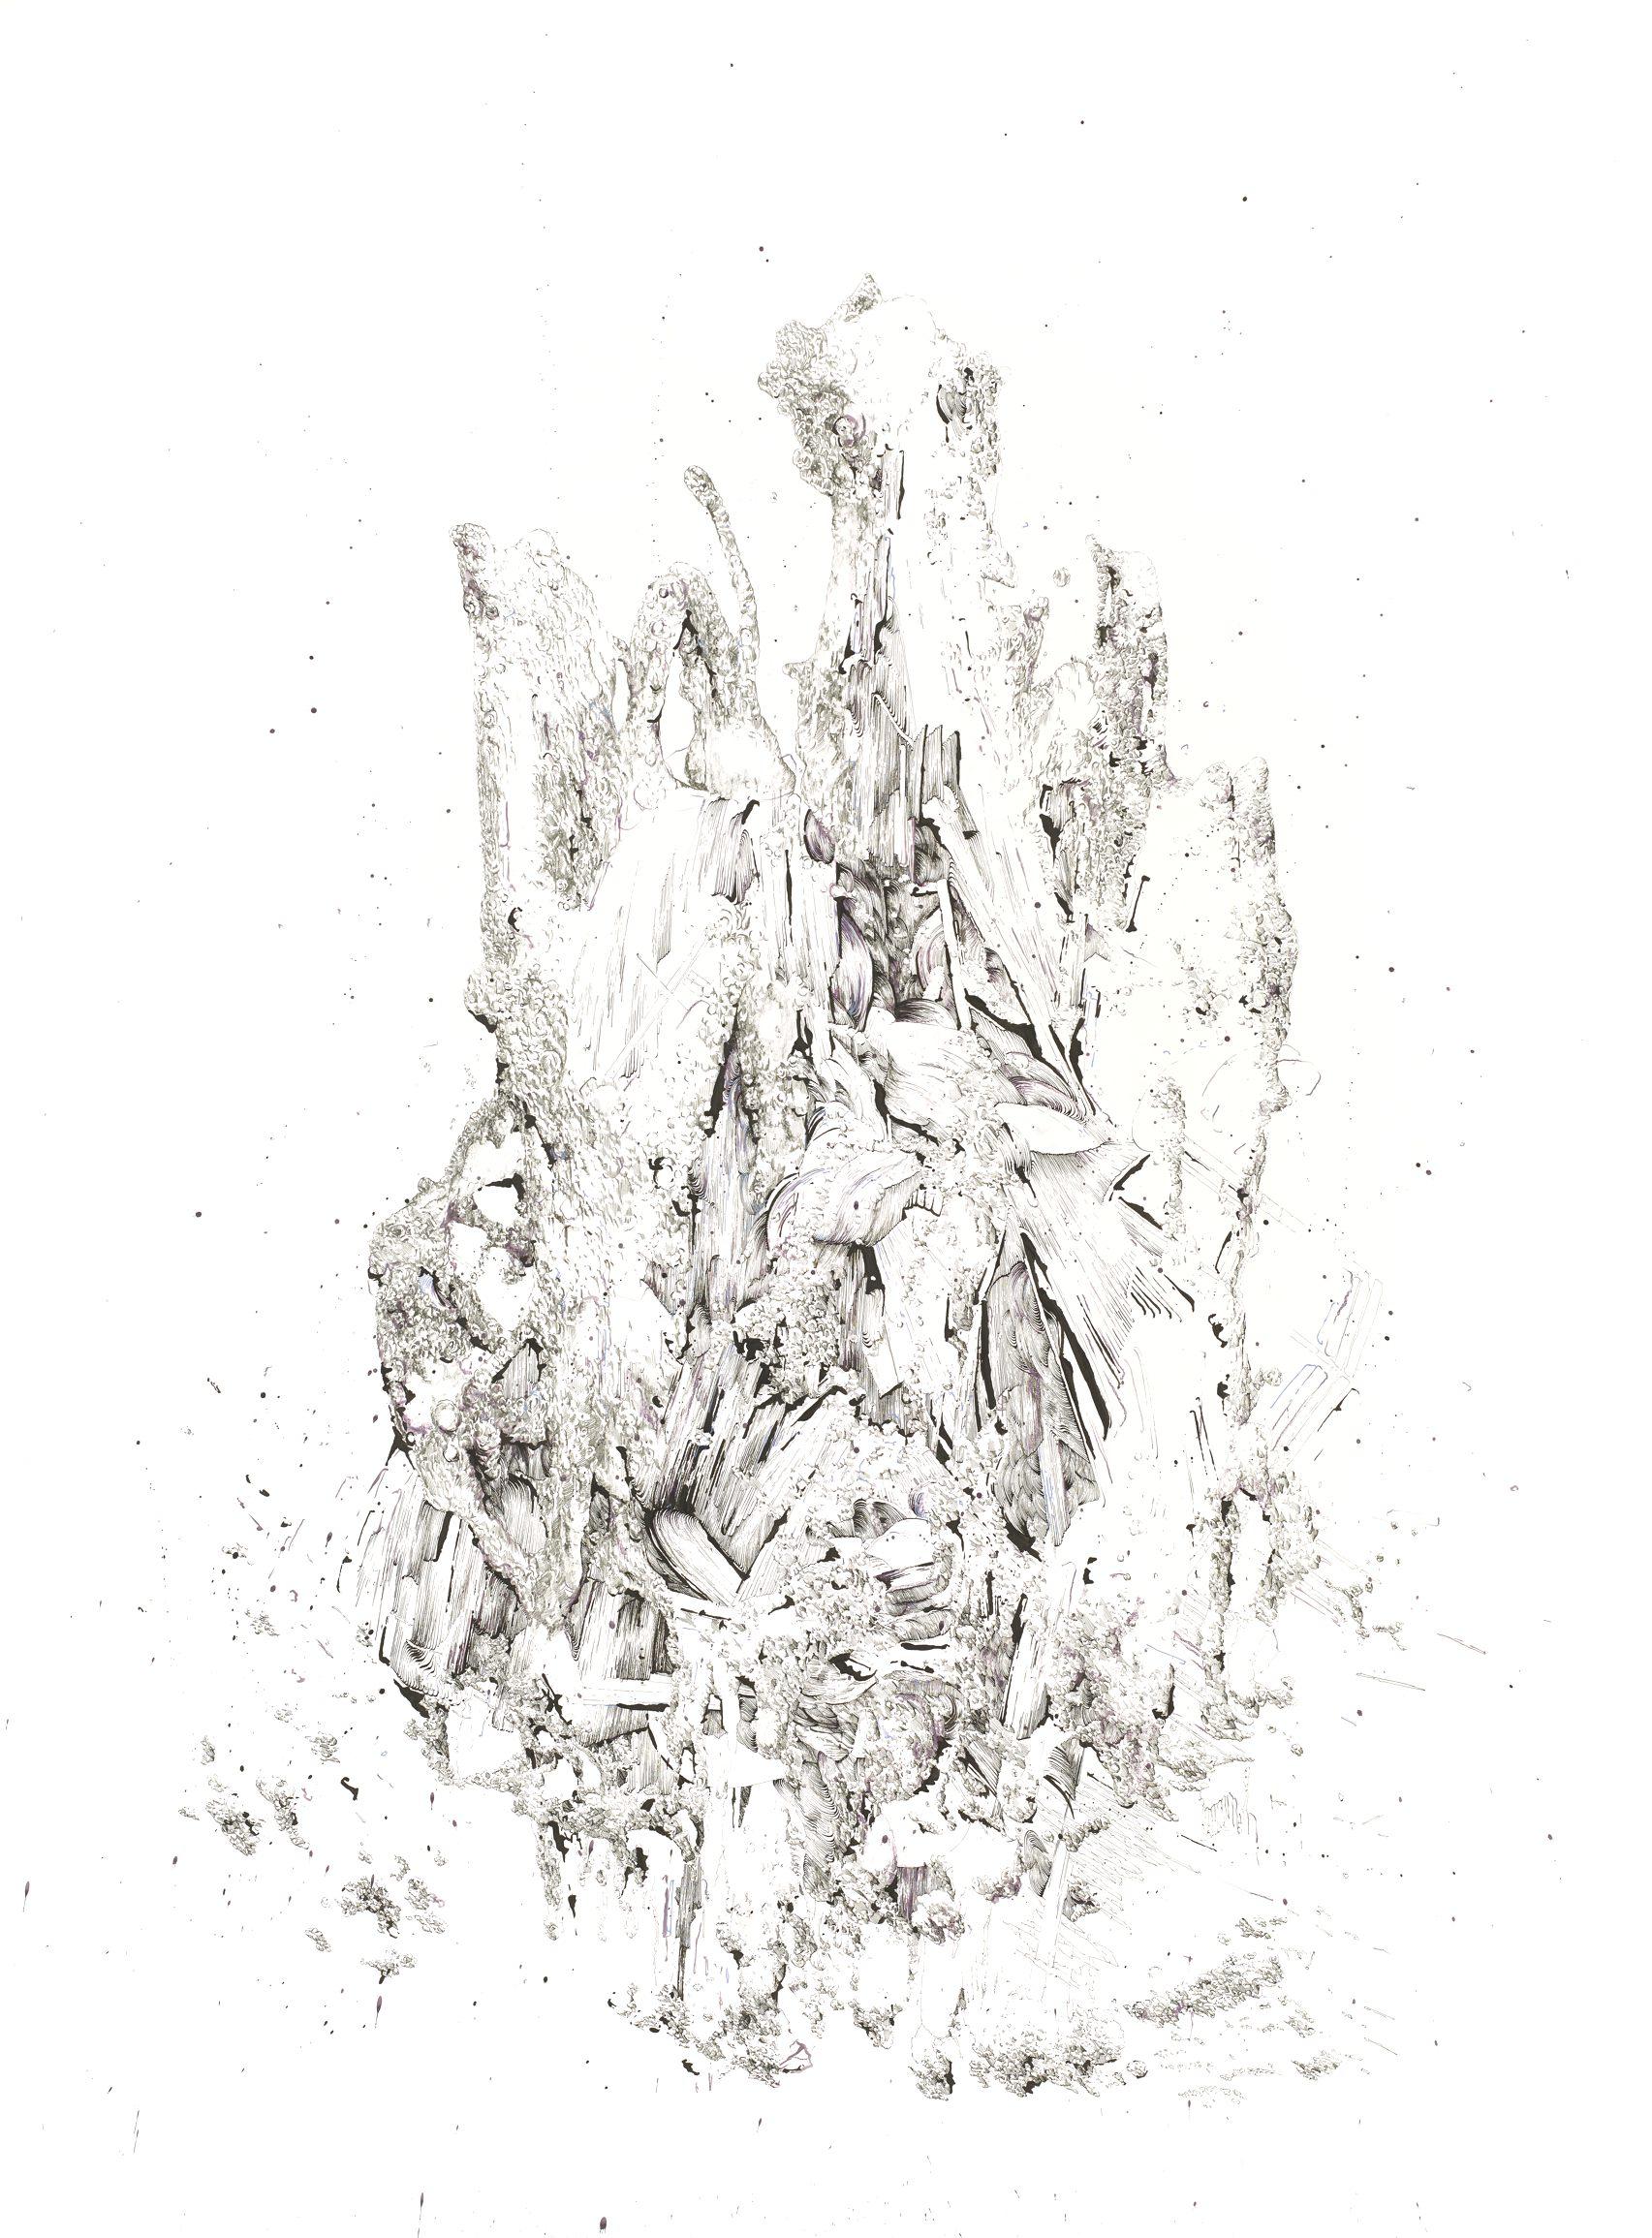 BK P133 | untitled | ink & graphit on paper | 200x150cm | 2013